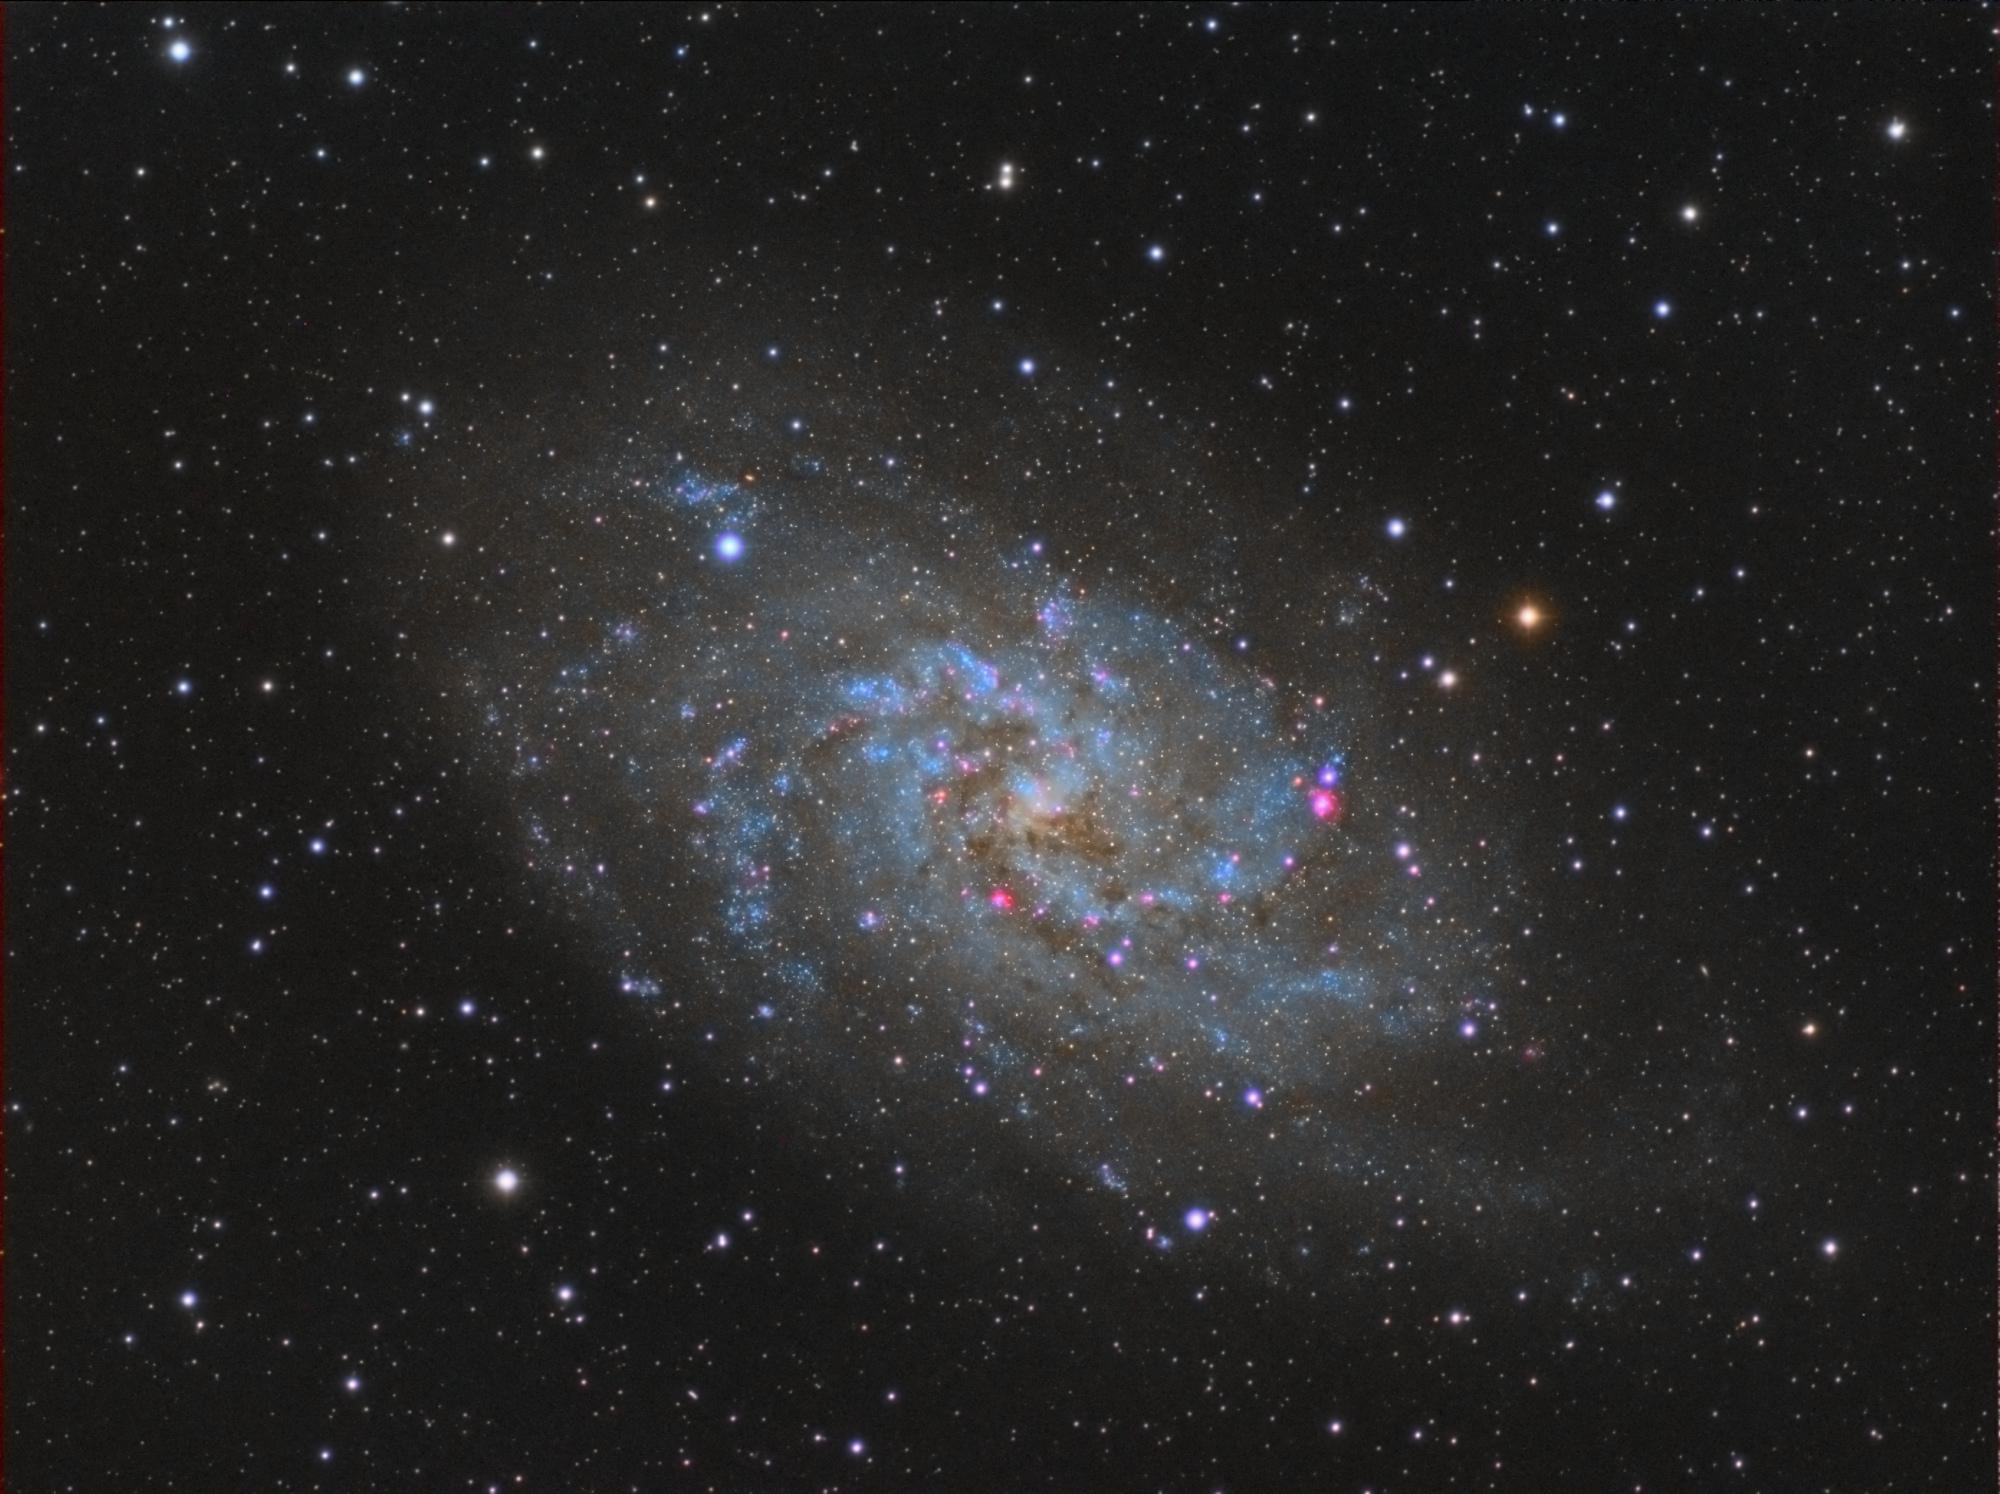 M33_v2_j.jpg.eb32d04fe99bbfb83b17f1800f4abd87.jpg